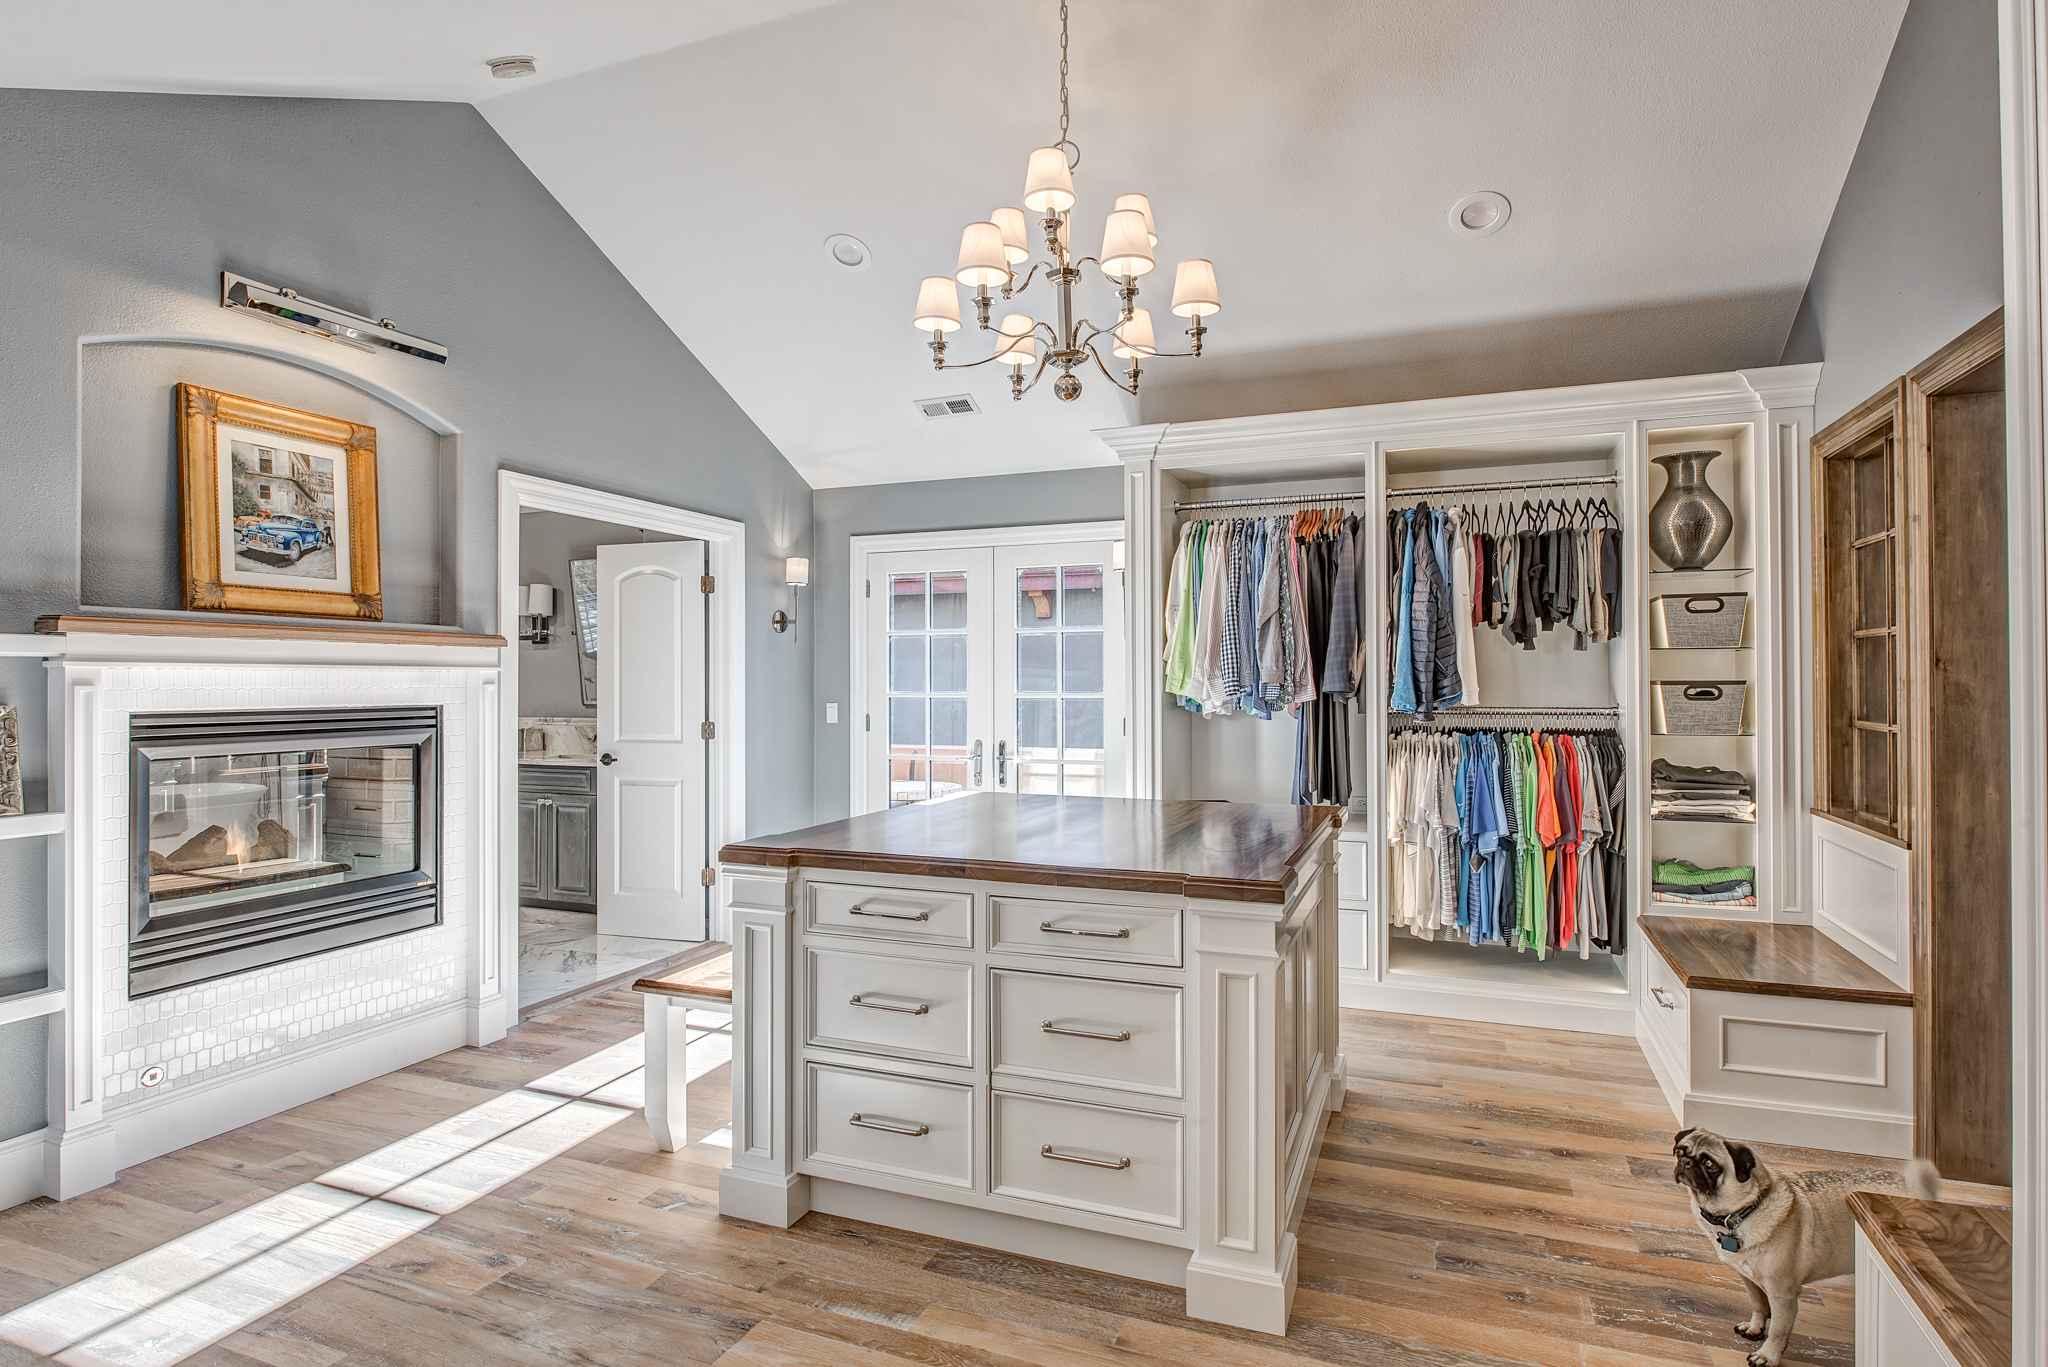 gray and white — sanctuary kitchen and bath design-10.jpg